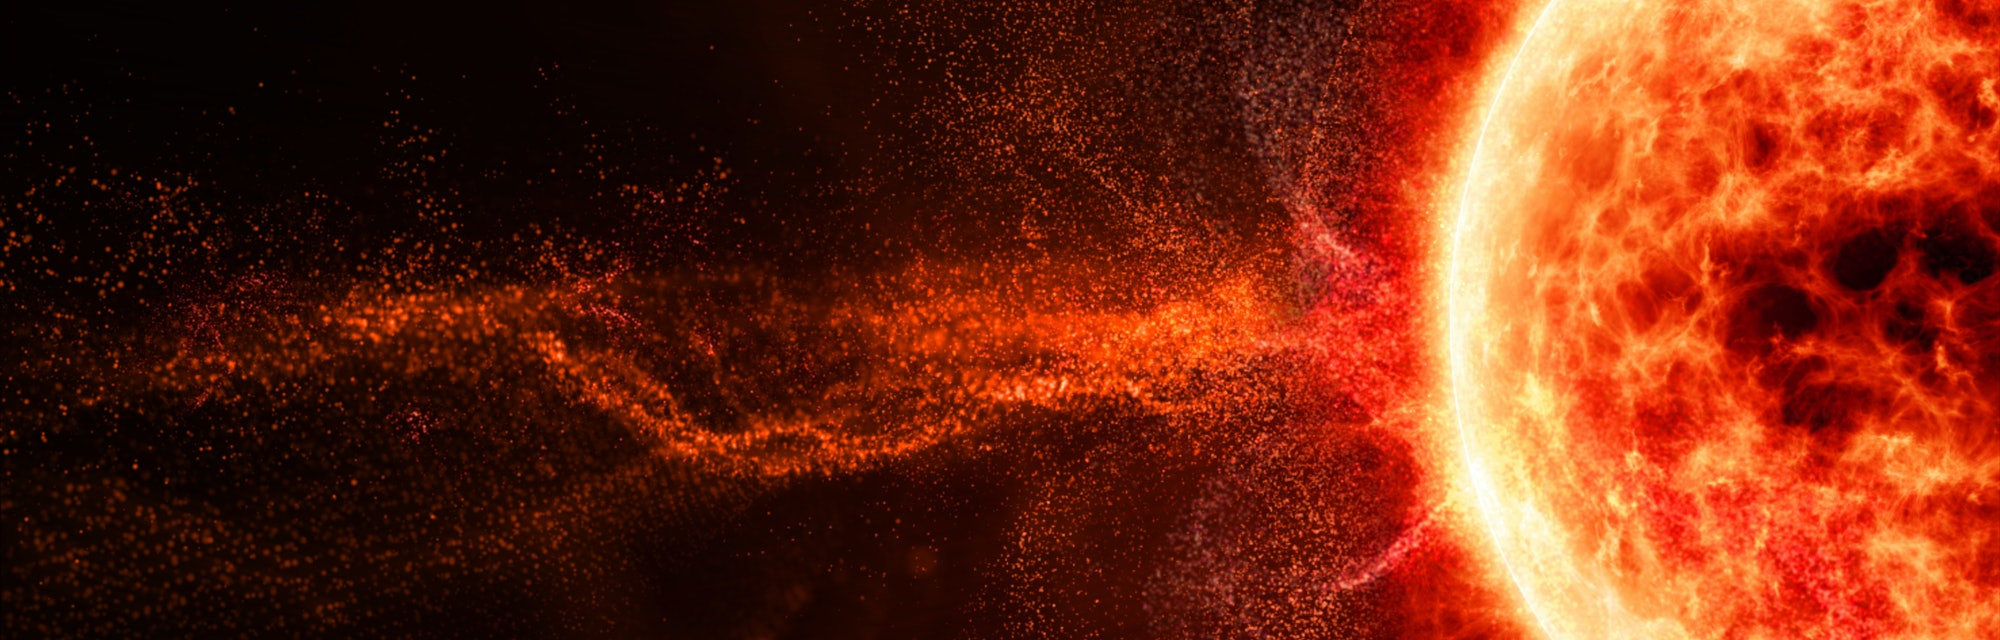 A solar flare.